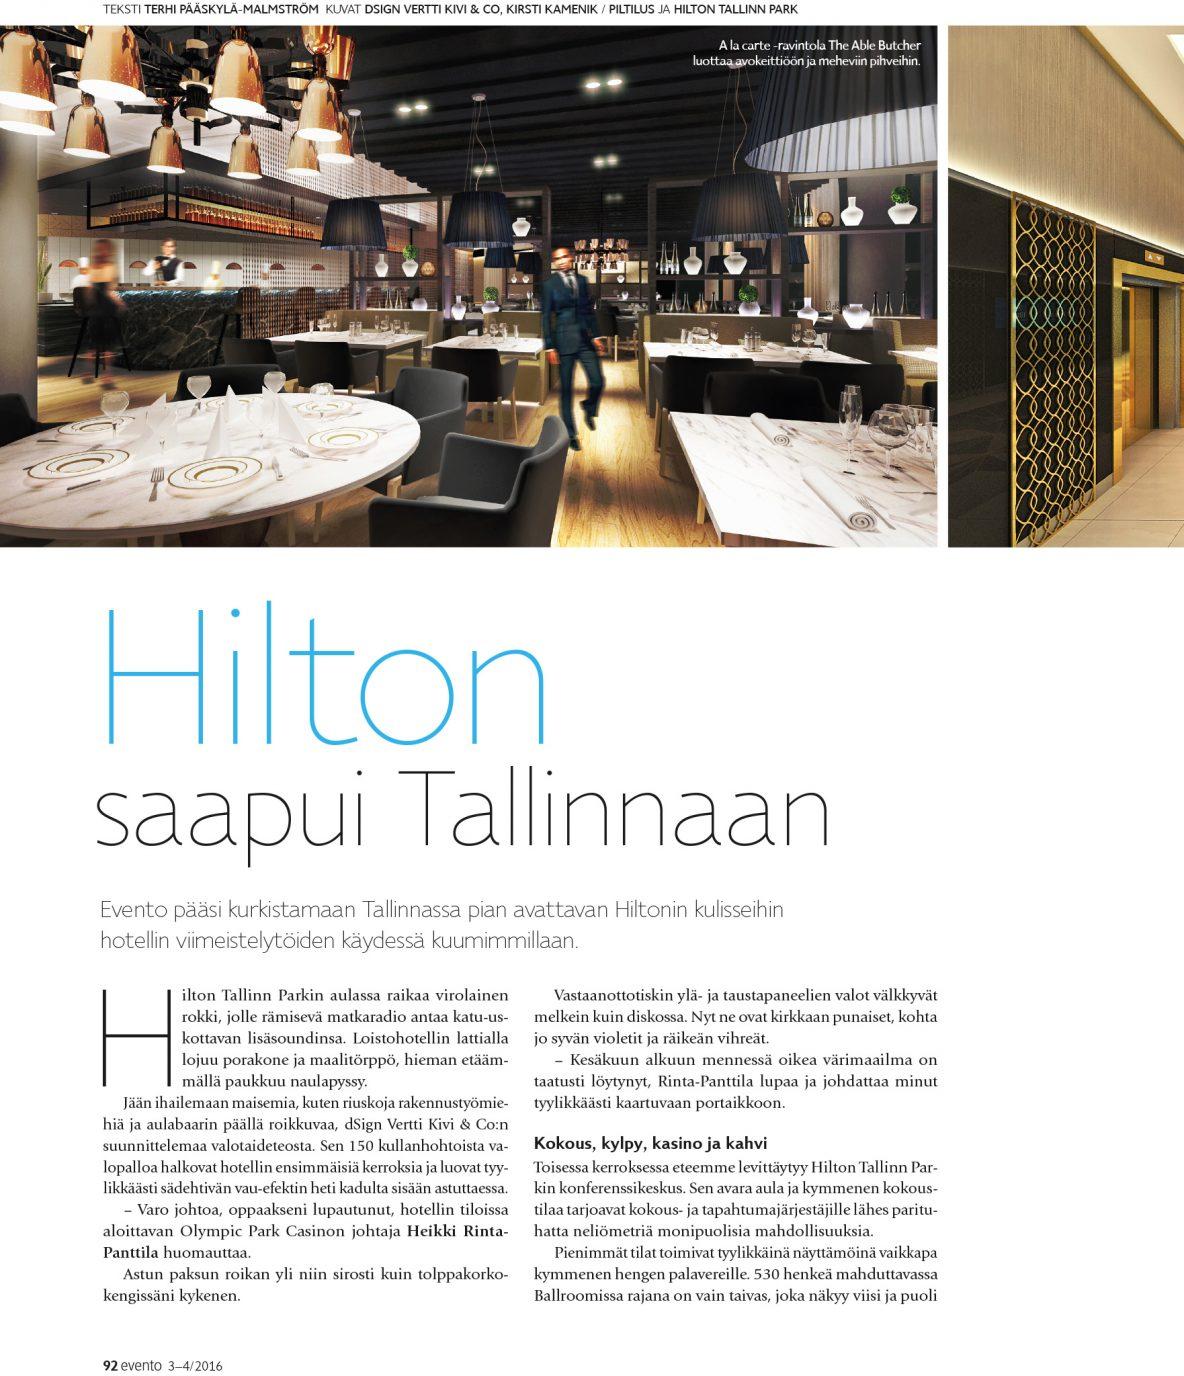 Hilton saapui Tallinnaan